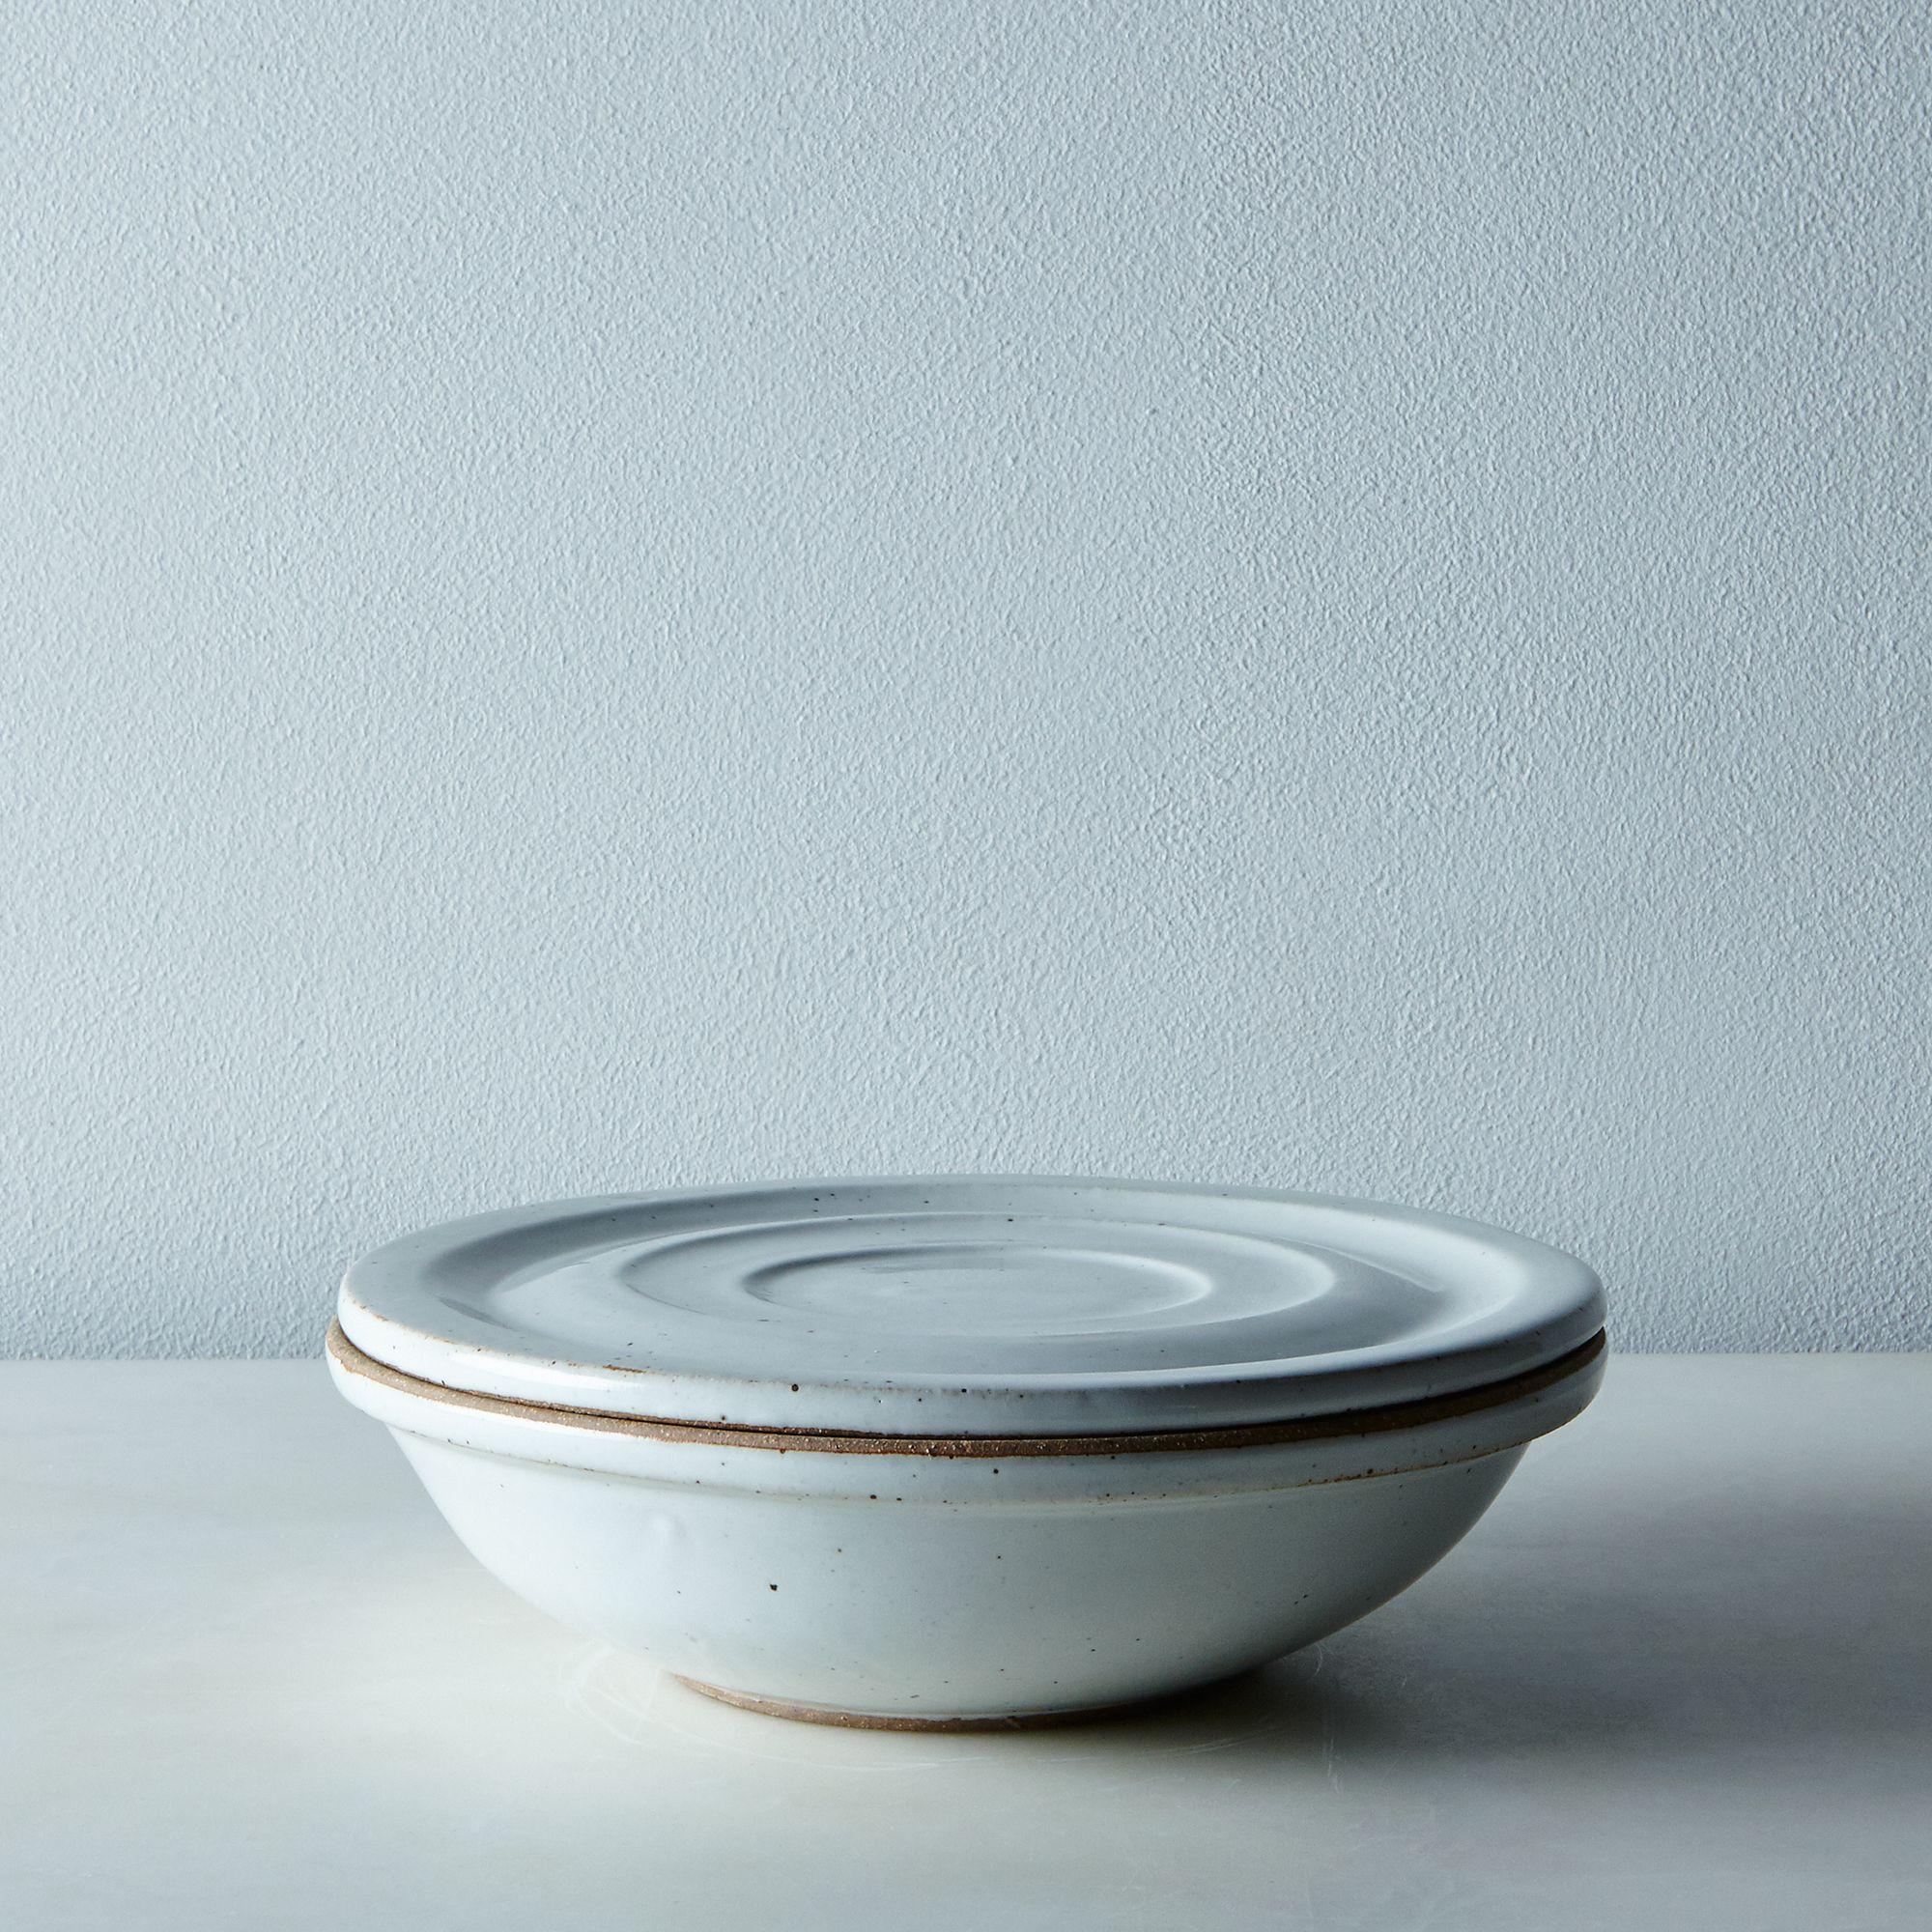 Dish by Pix lip